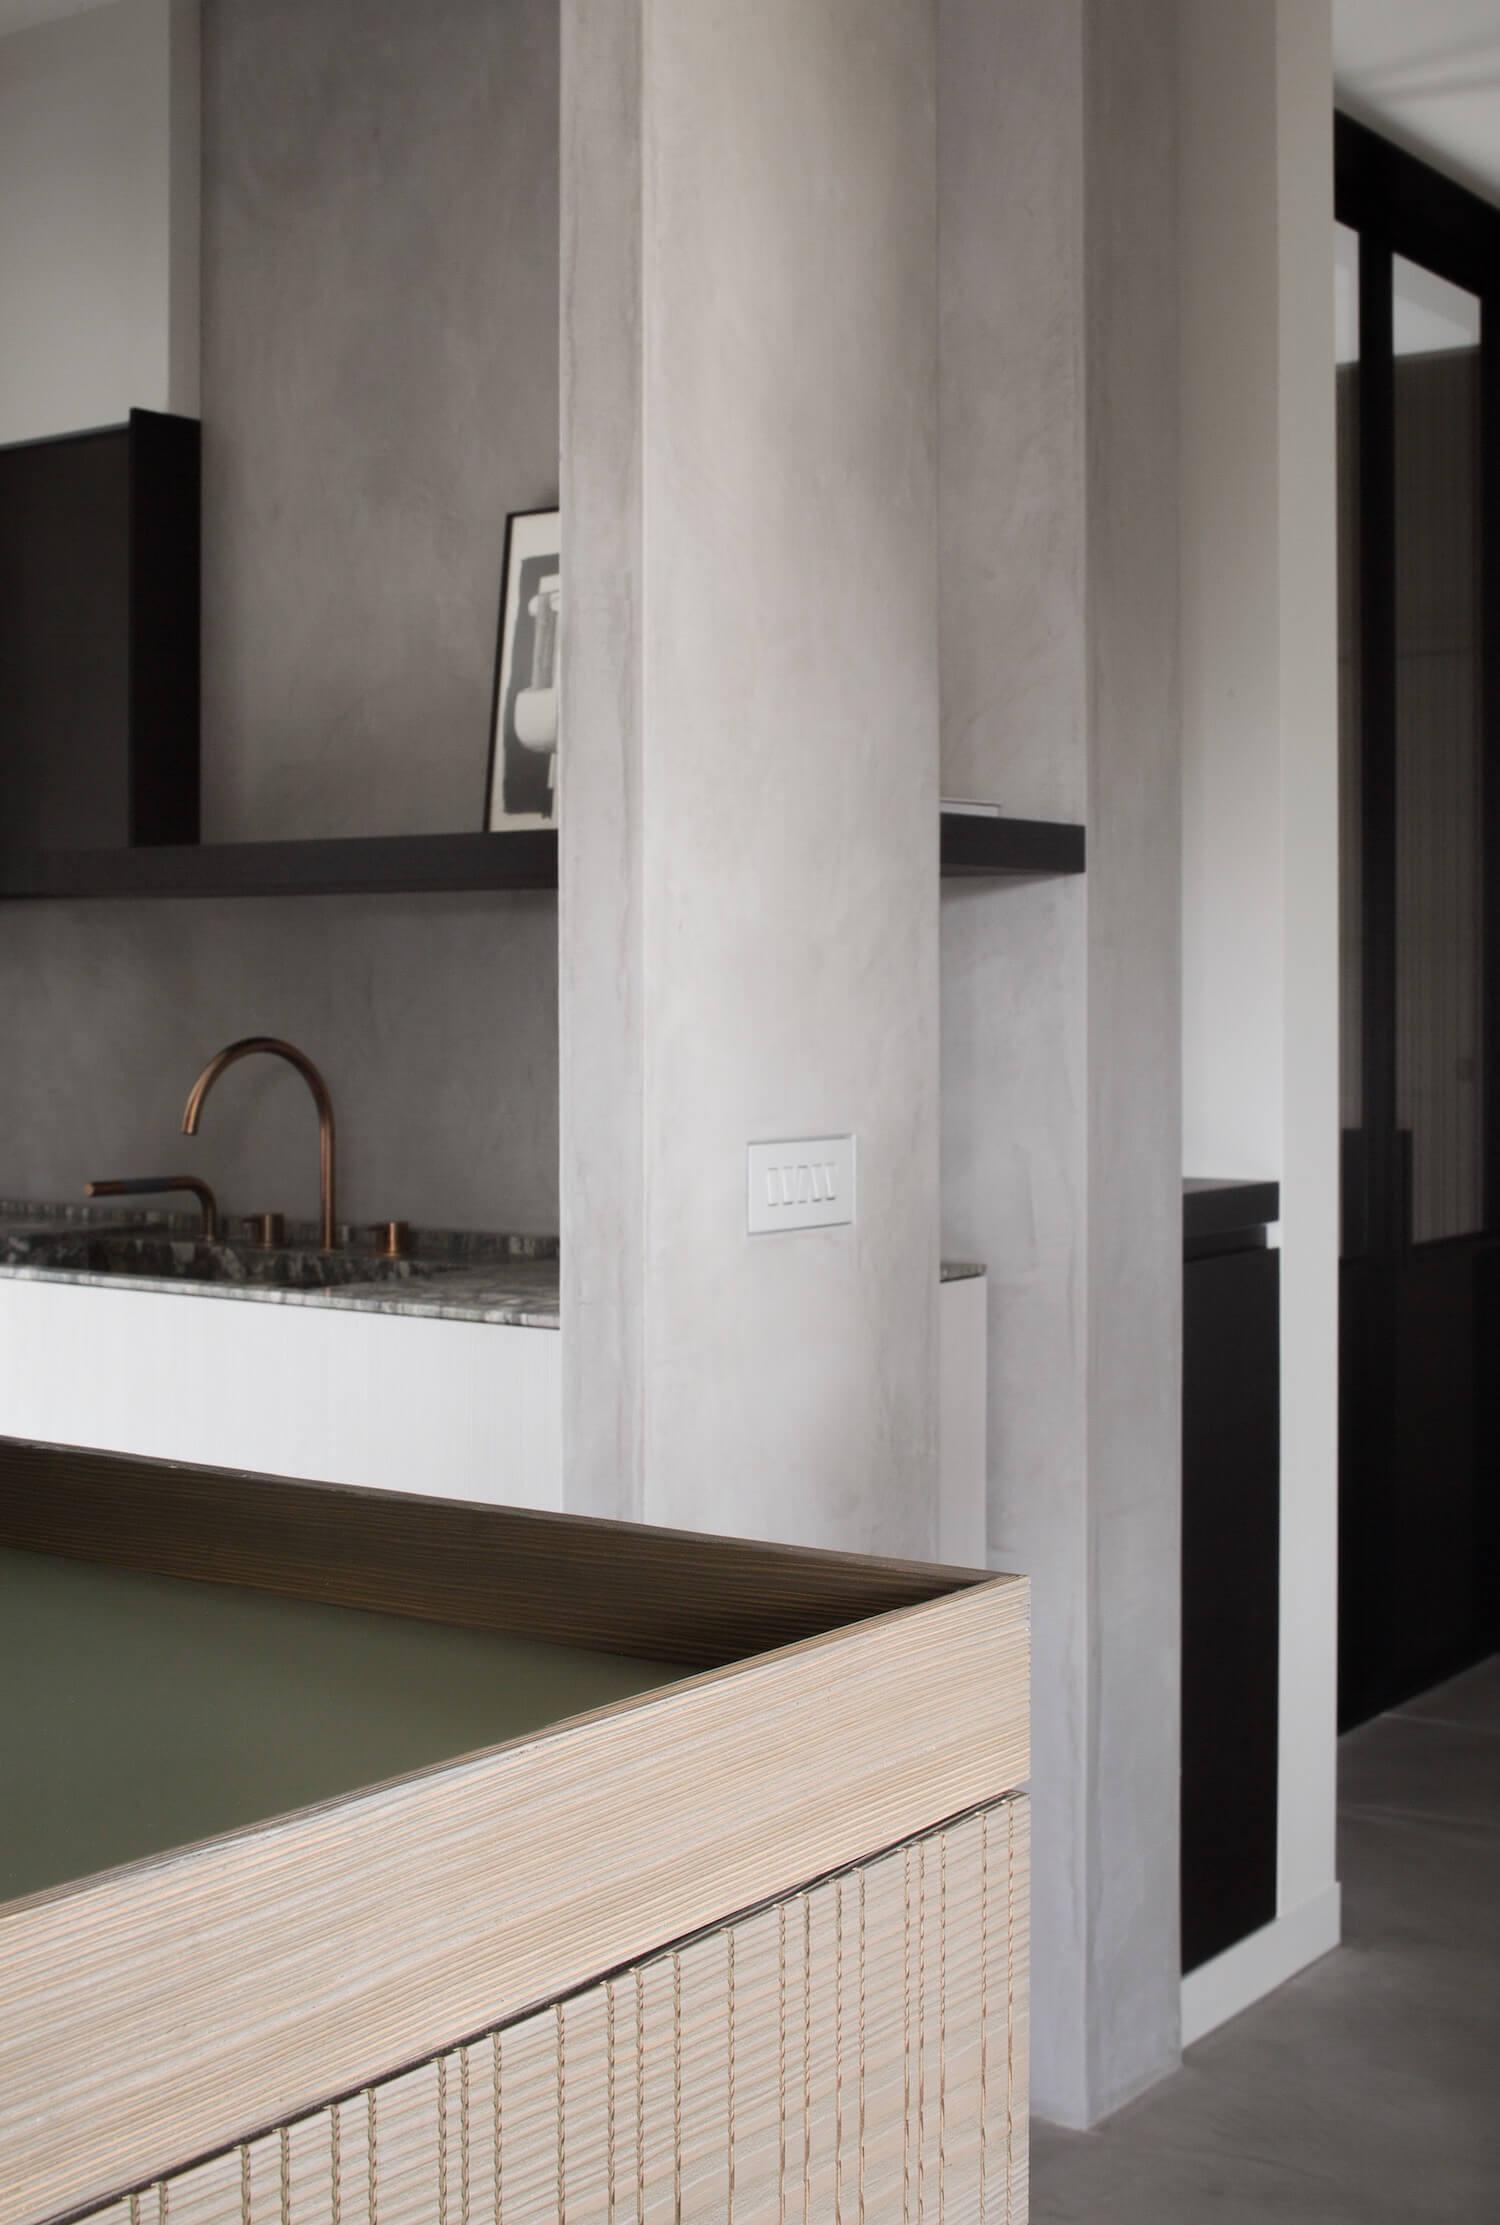 est living frederic kielemoes cafeine belgian apartment 7